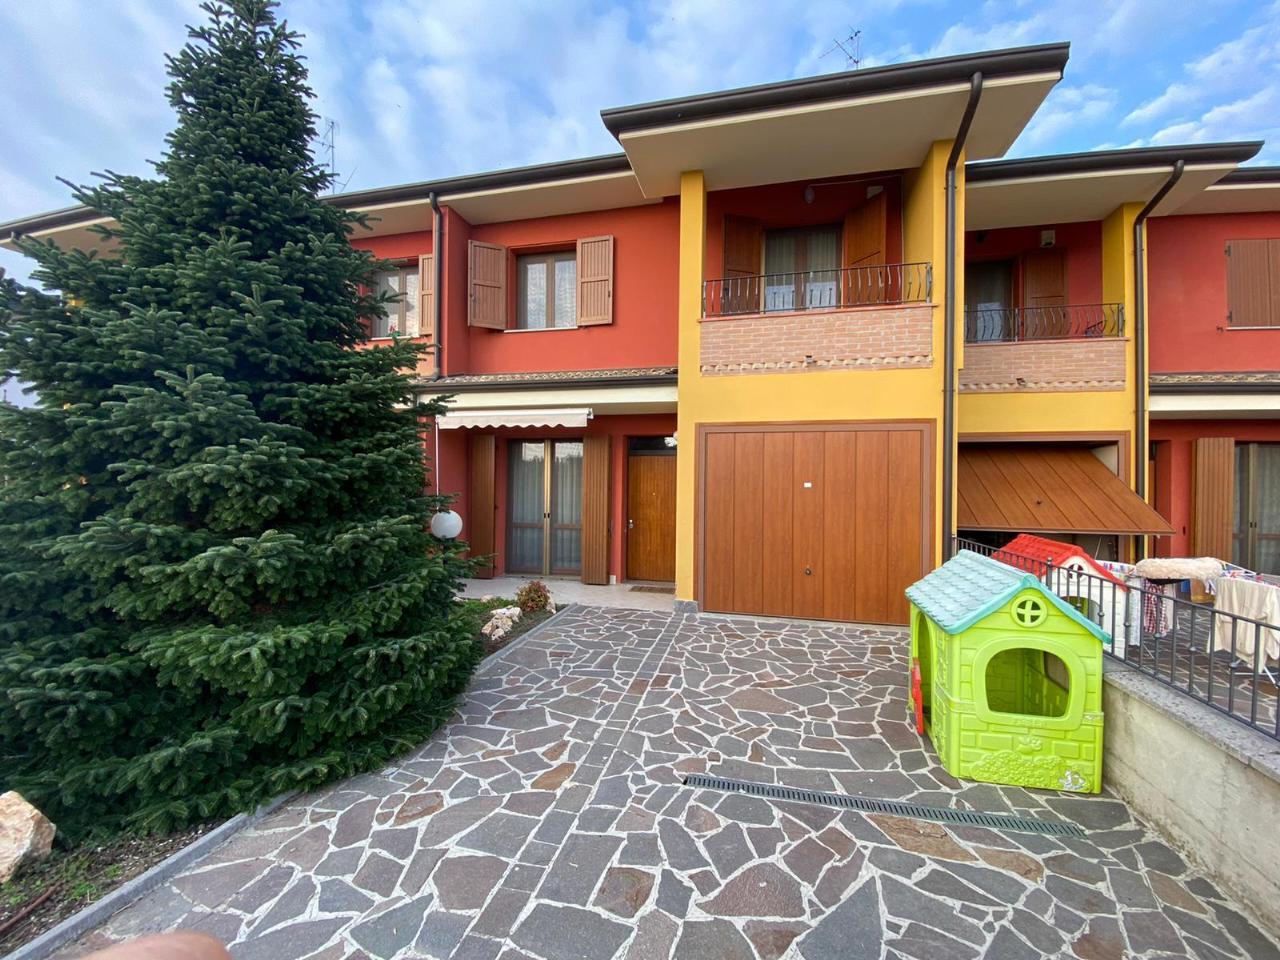 Villa a schiera CASTELVERDE Euro 185.000,00